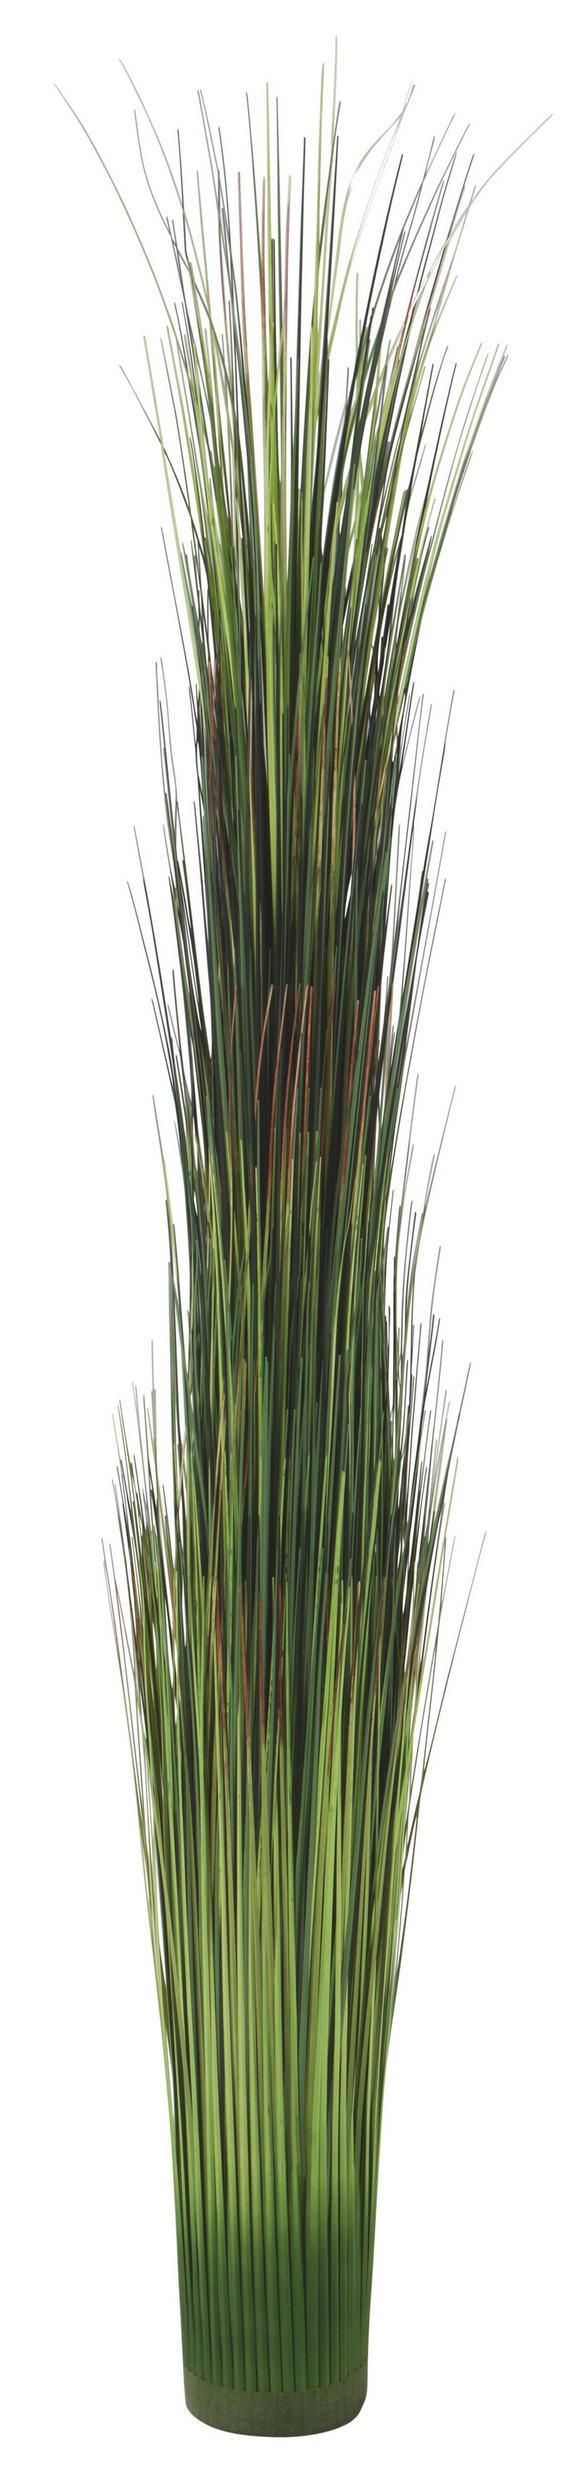 Fűcsomó Markus - Zöld, Műanyag (120cm)